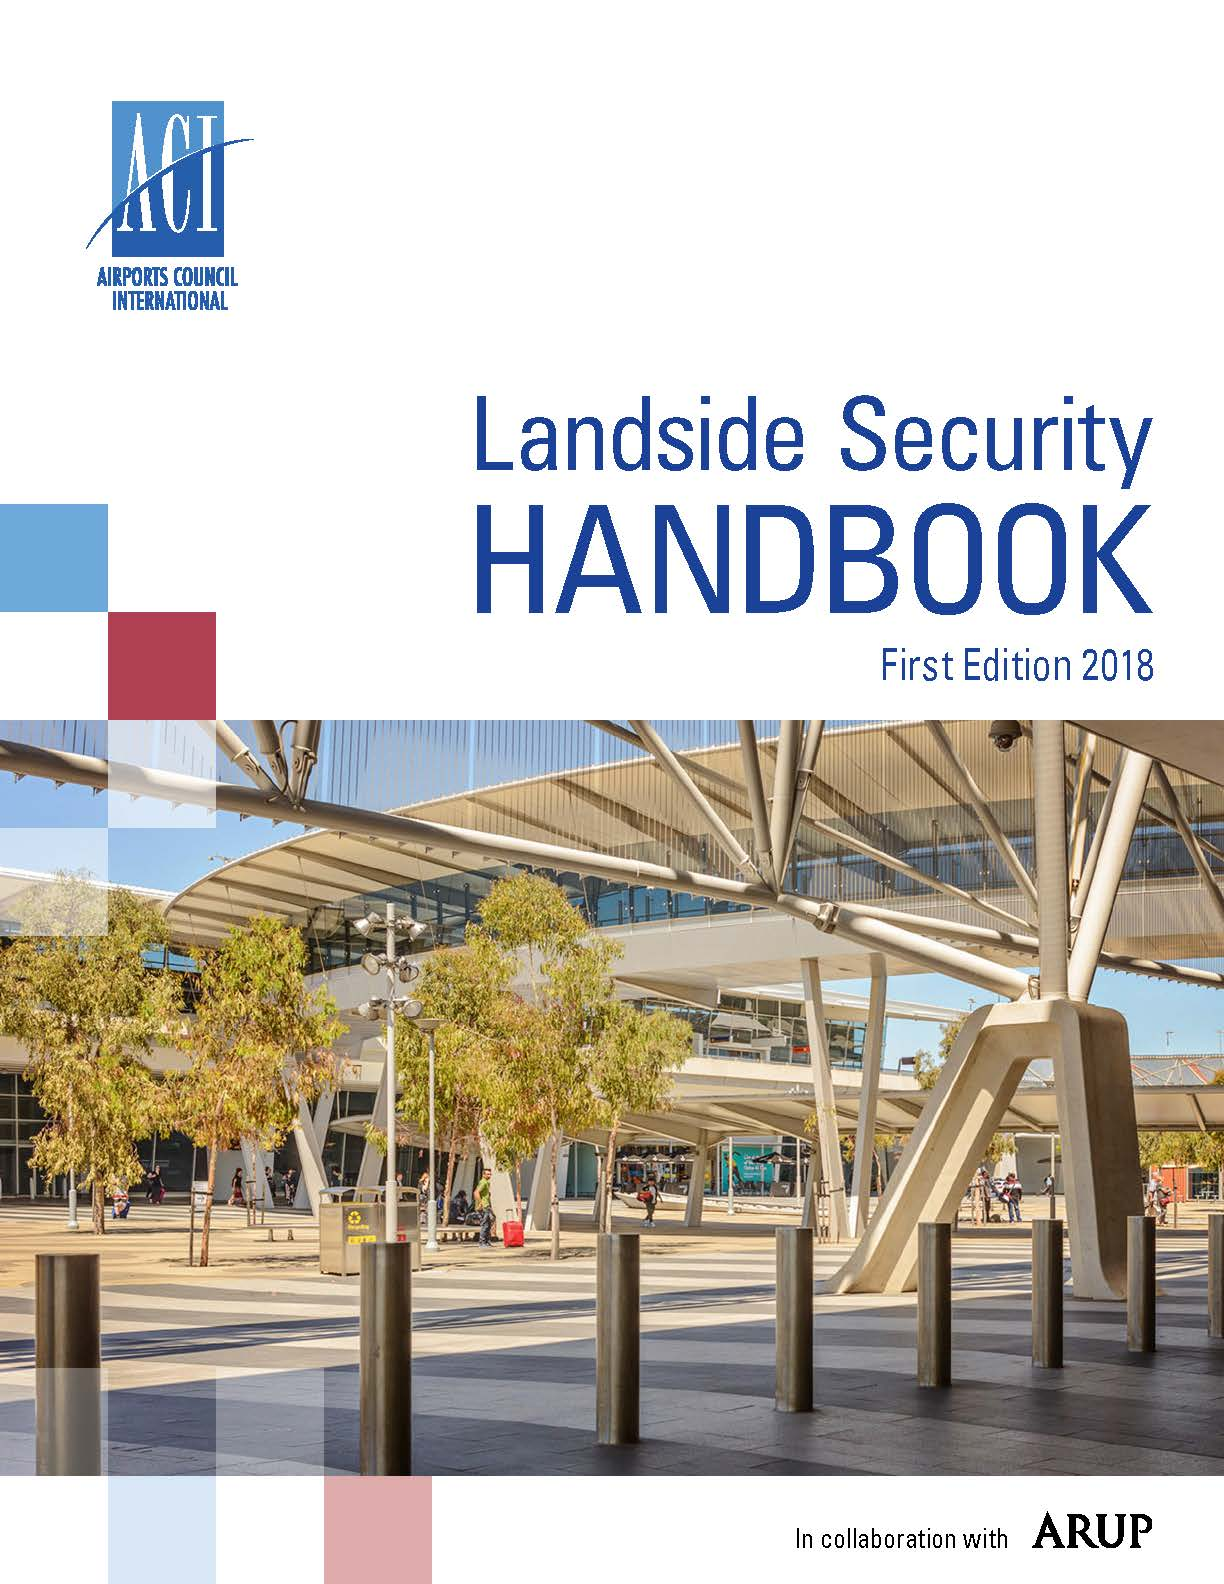 ACI World Landside Security Handbook 1st edition 2018